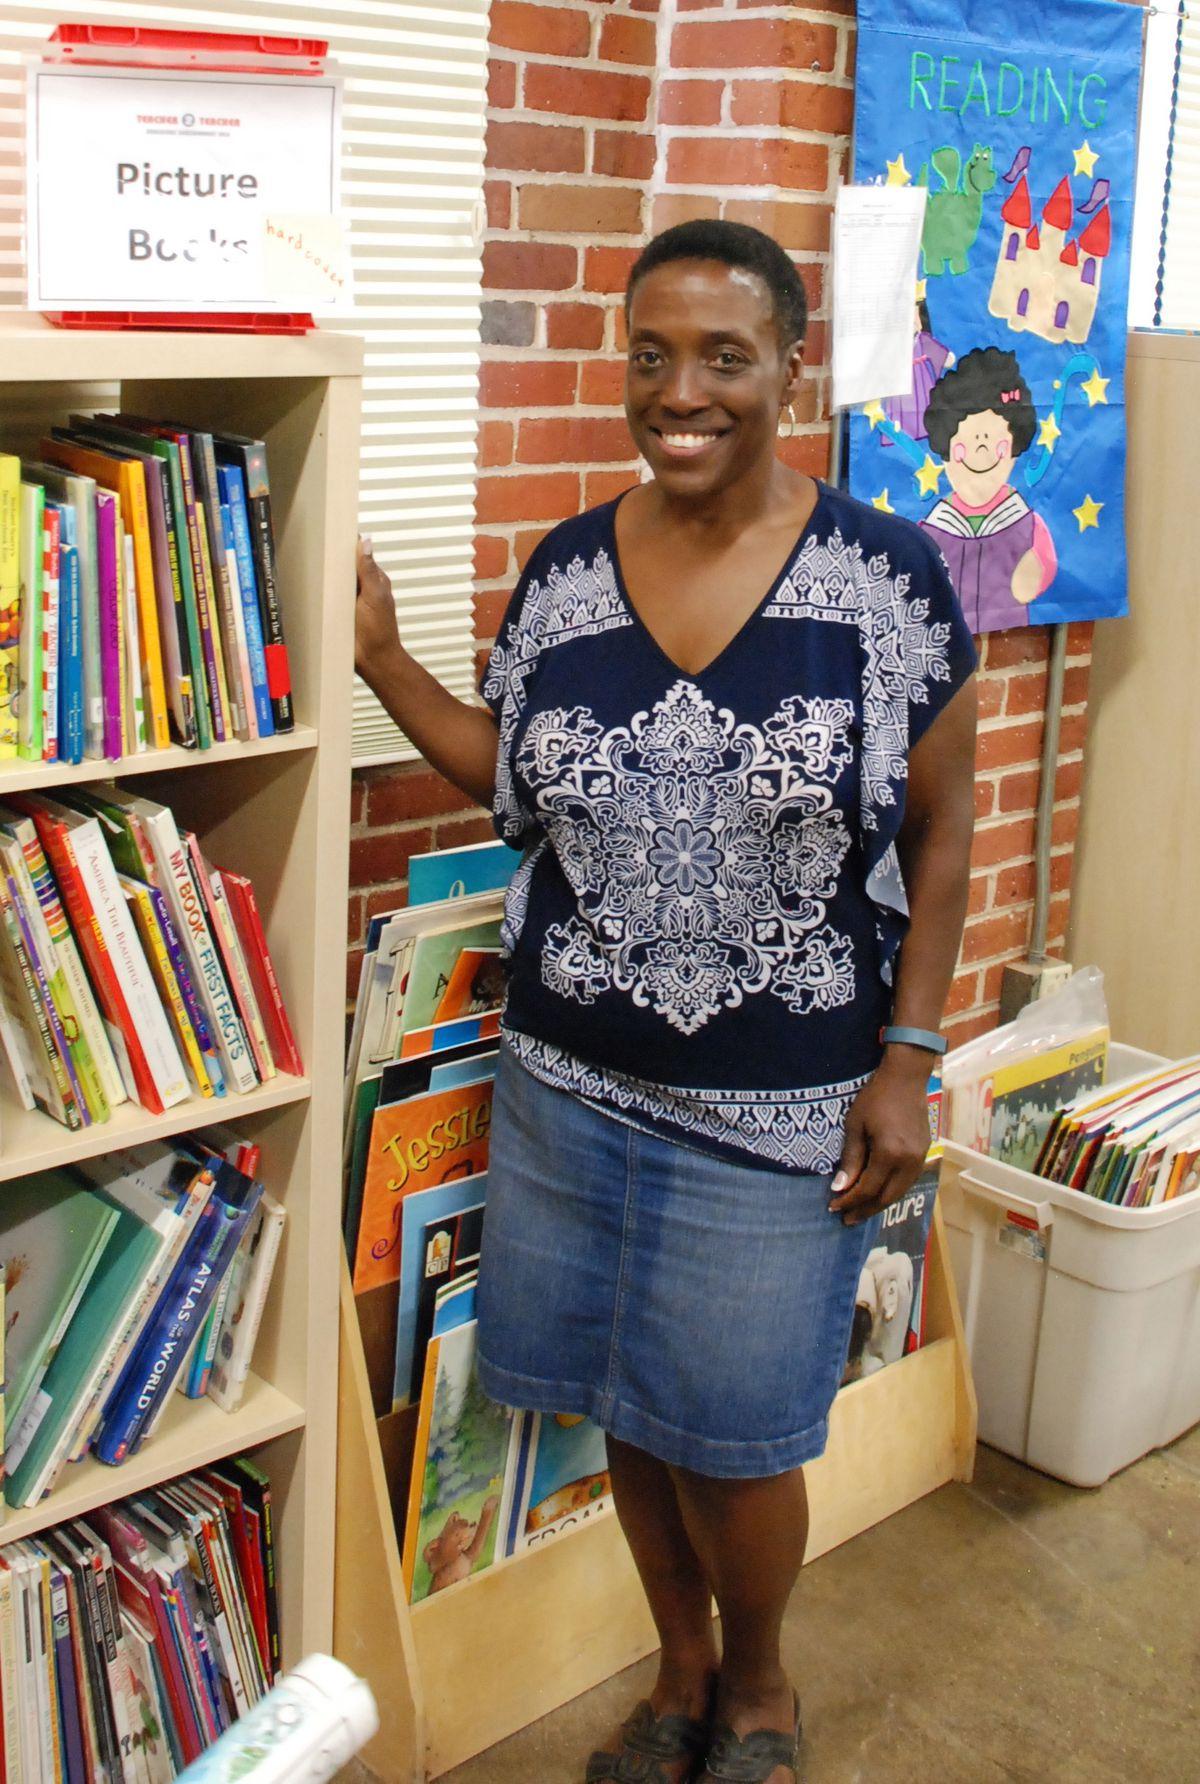 Gwen Vann, a retired Jeffco teachers, spearheaded the Teacher 2 Teacher Educators Consignment Sale.